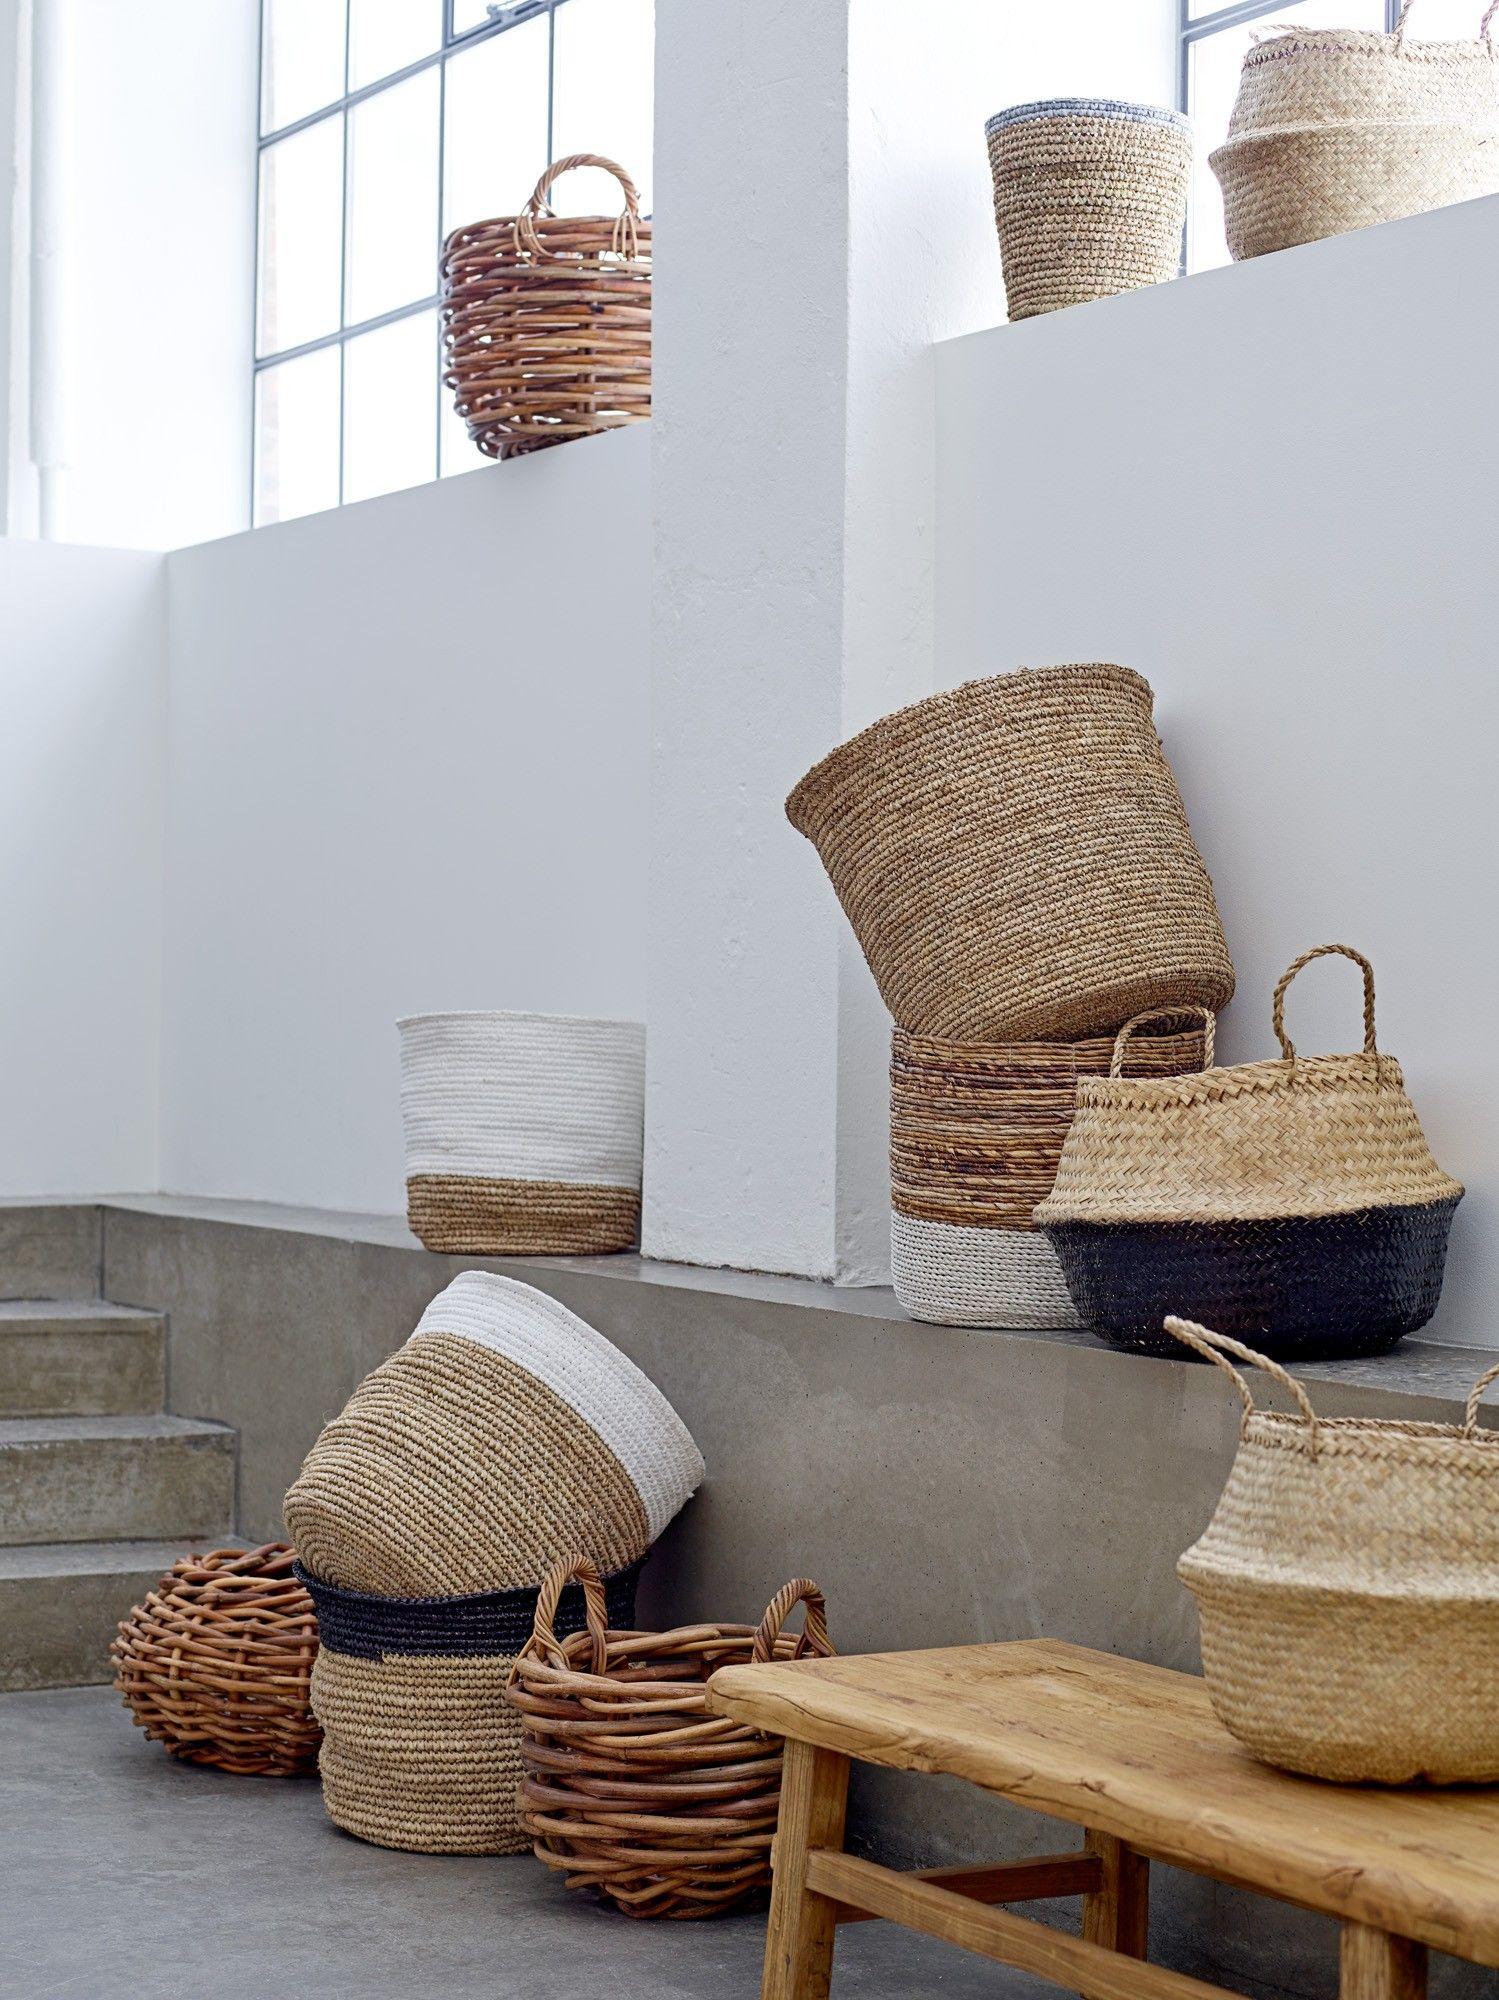 Design Vintage | White Raffia Baskets | Woven | Bloomingville & Design Vintage | White Raffia Baskets | Woven | Bloomingville ...